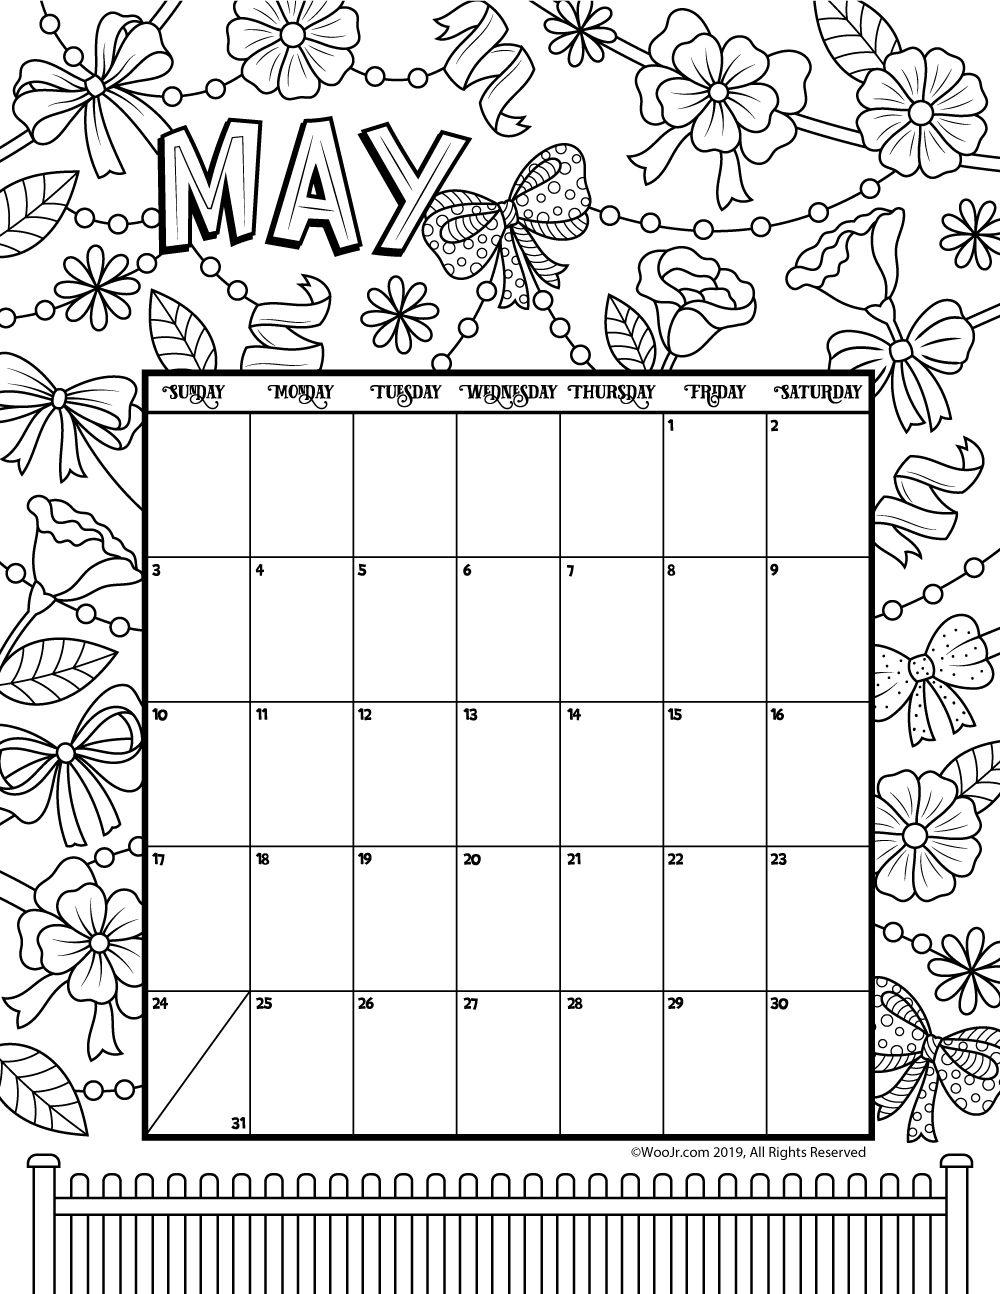 May 2020 Coloring Calendar Coloring Calendar Kids Calendar